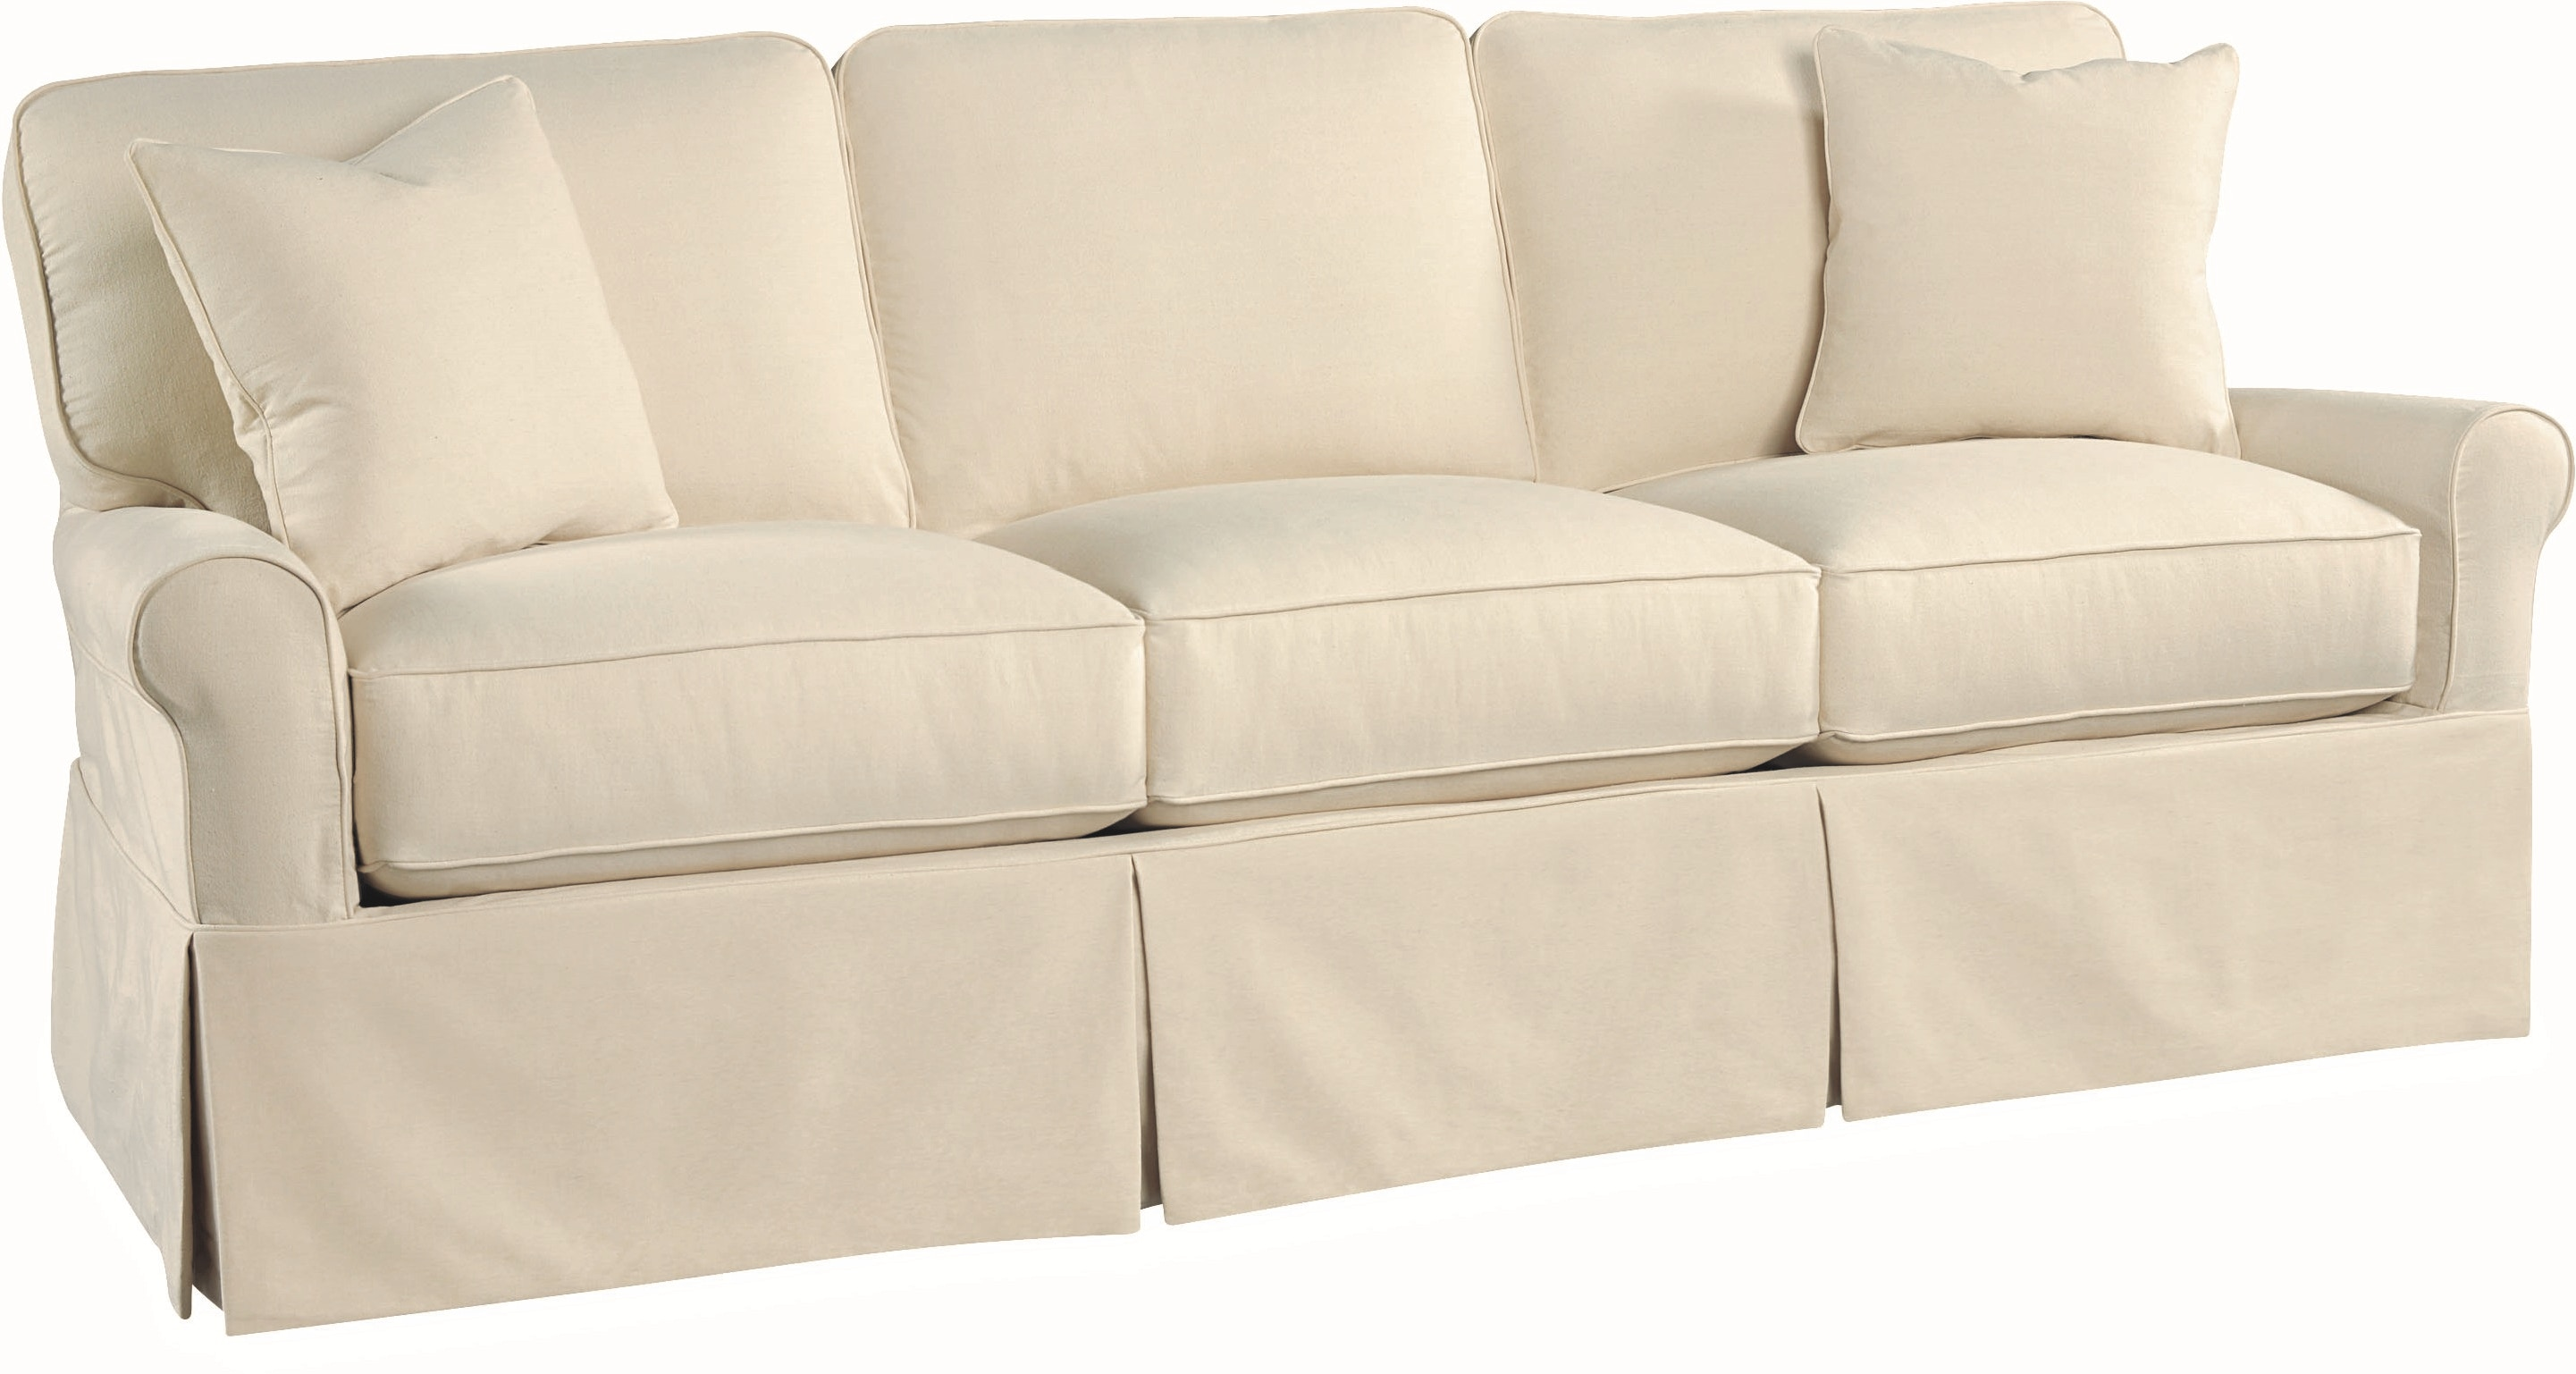 Lee Industries Living Room Slipcovered Sofa C5632 03 Tin